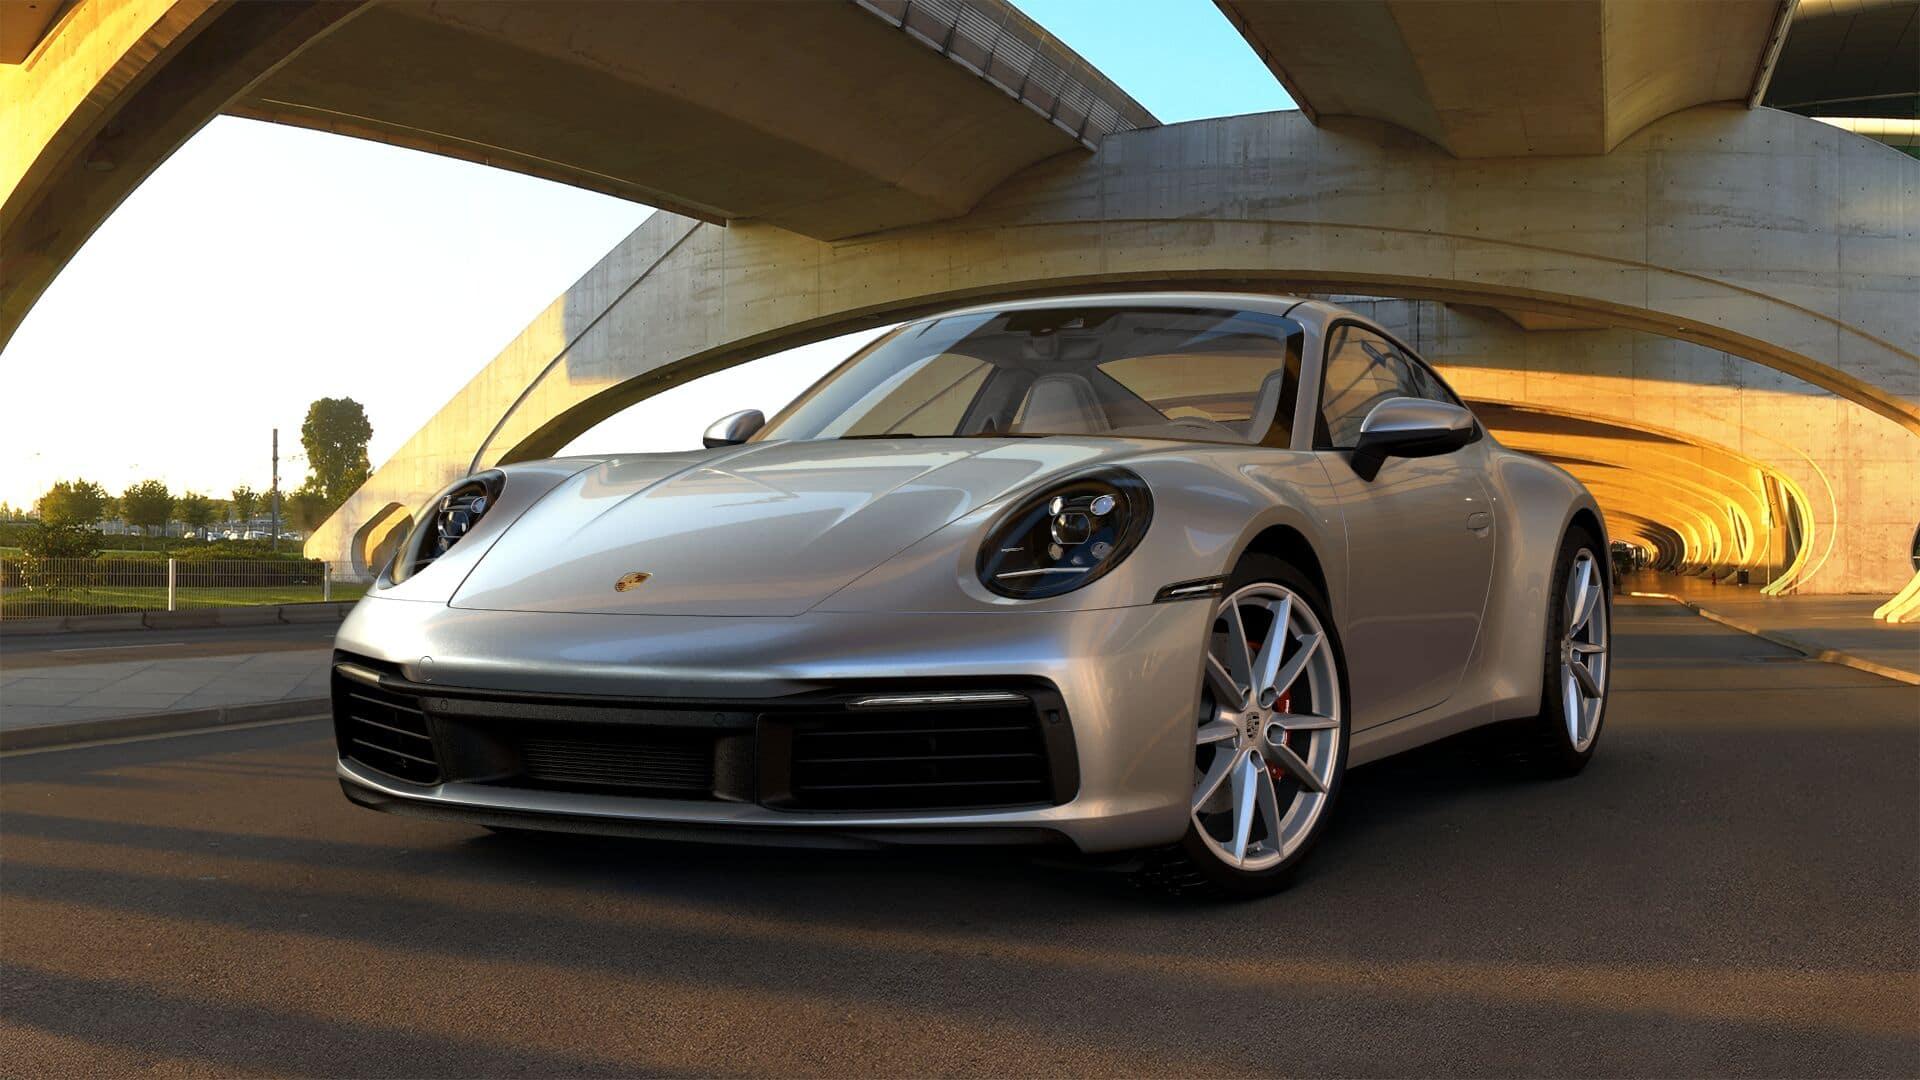 New Porsche 911 >> The All New 2020 Porsche Carrera 911 992 Porsche Toms River